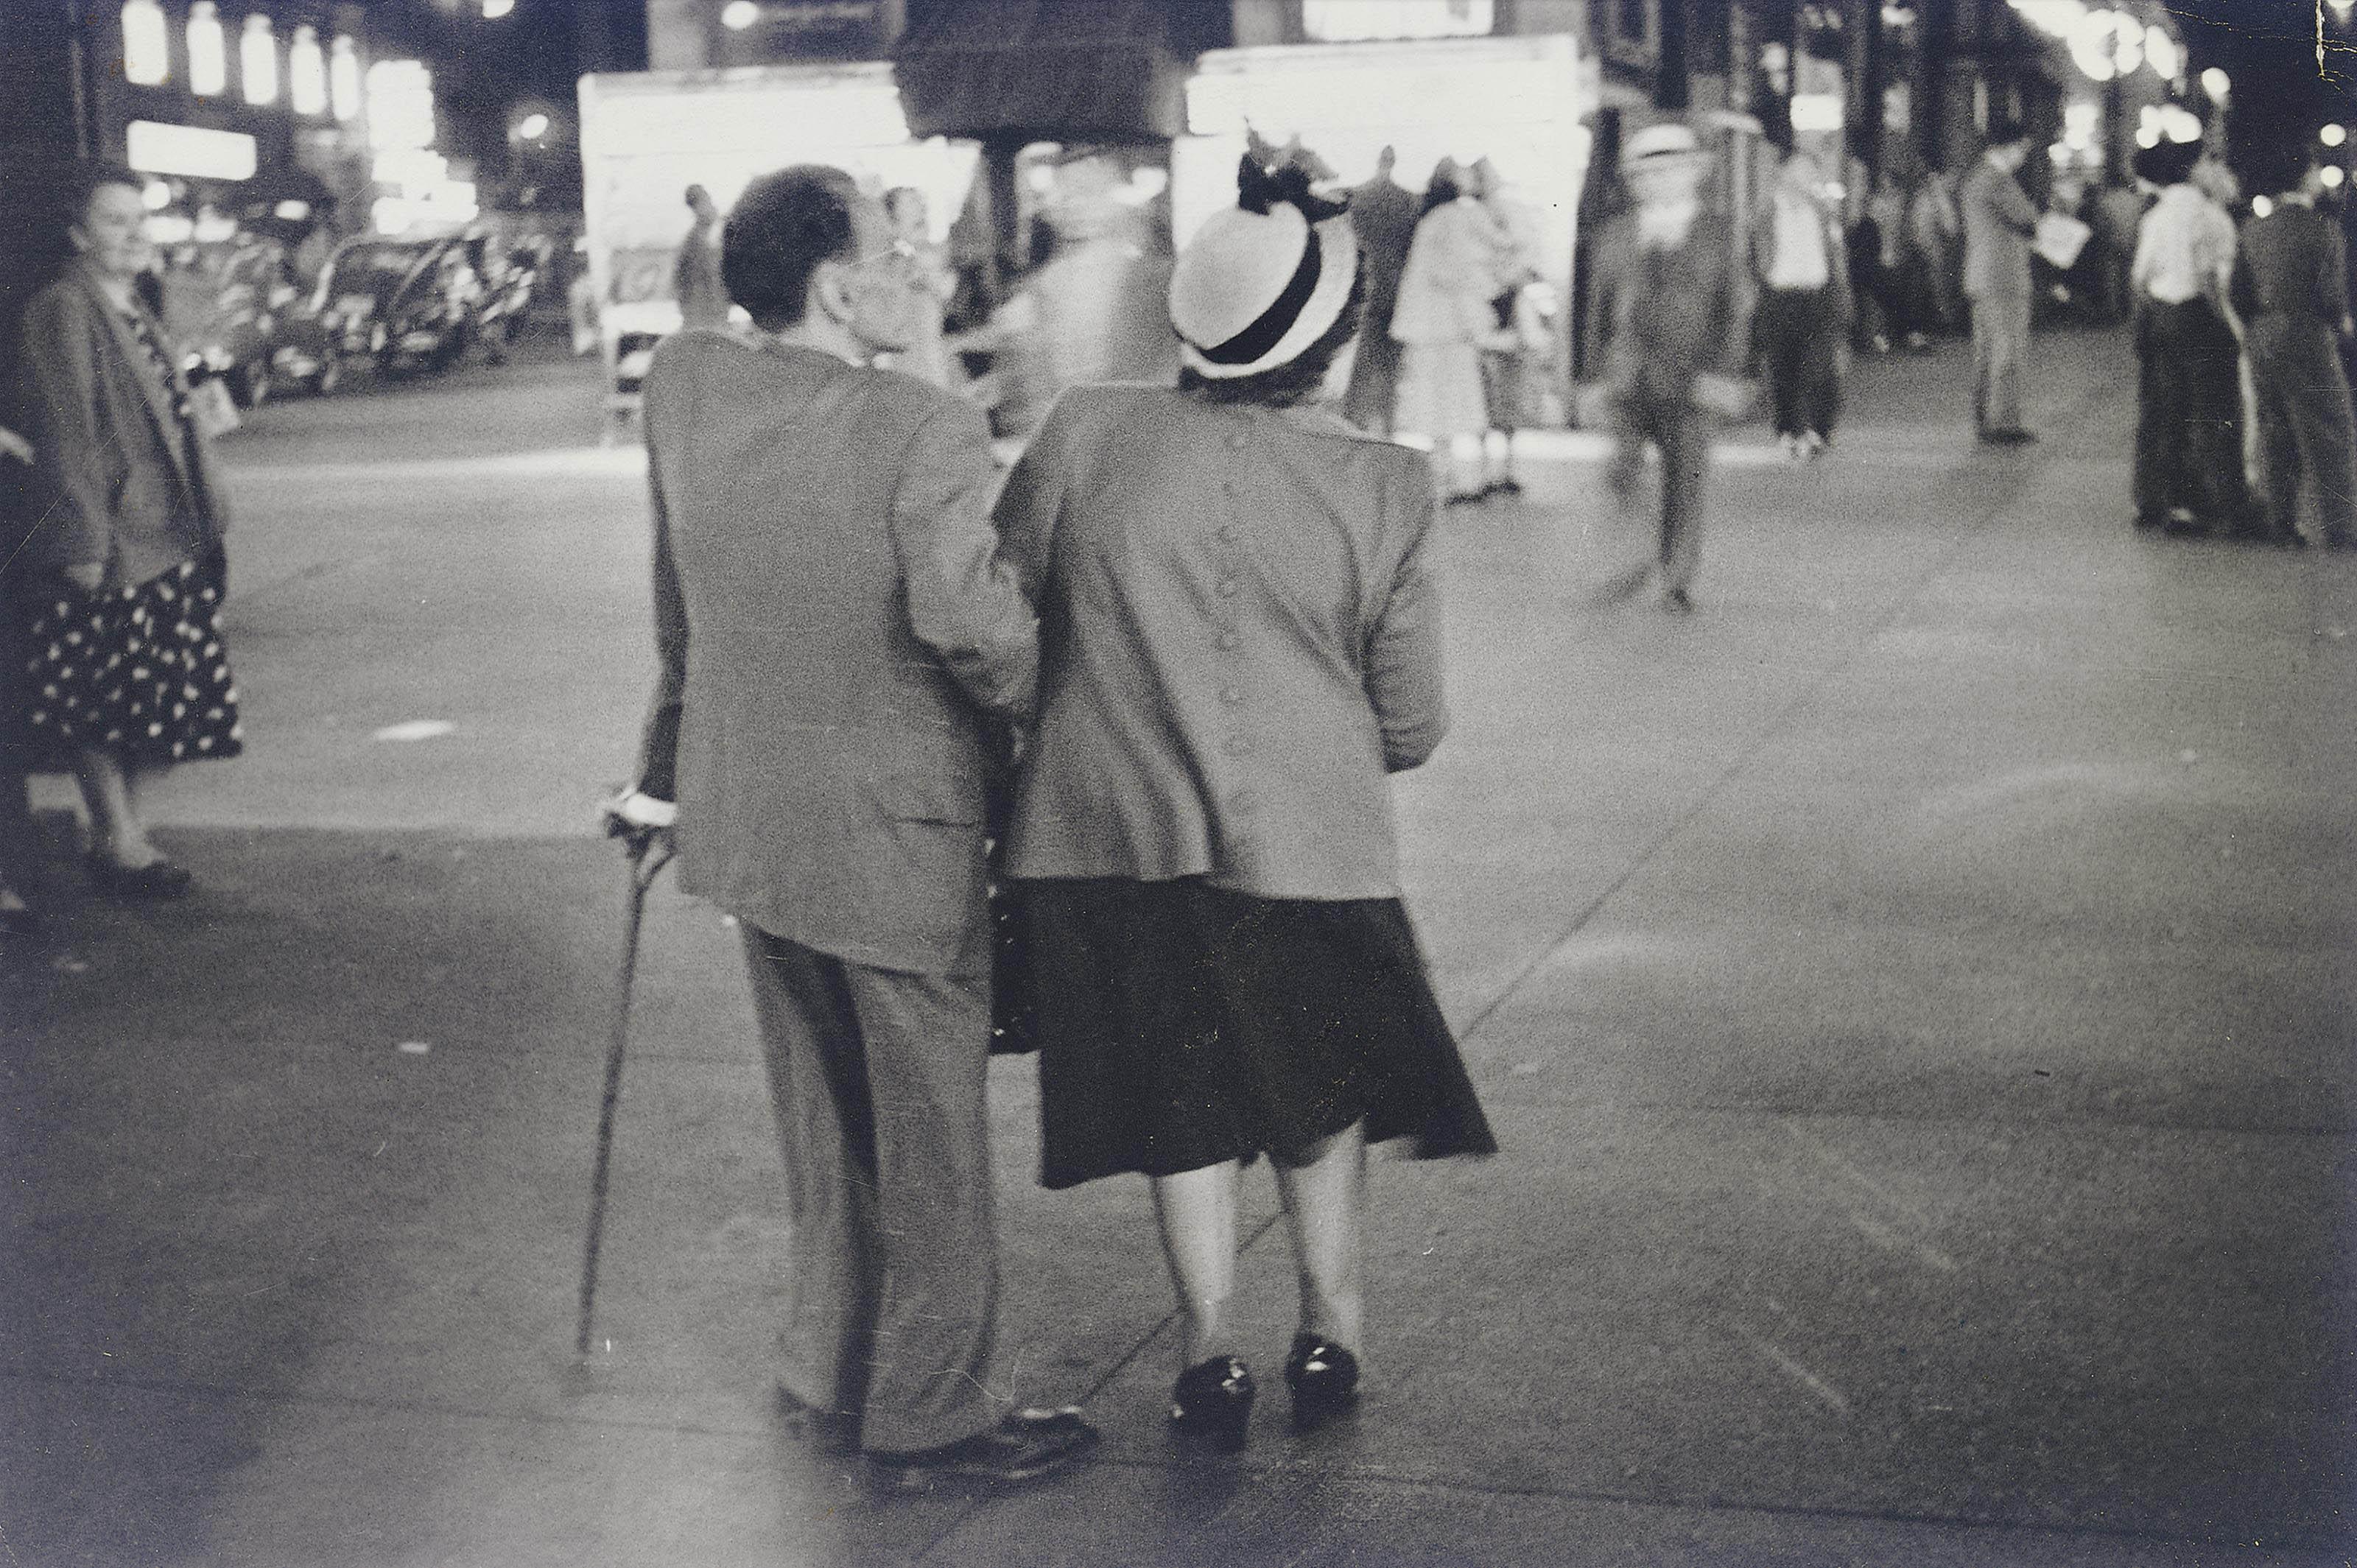 New York, c. 1947